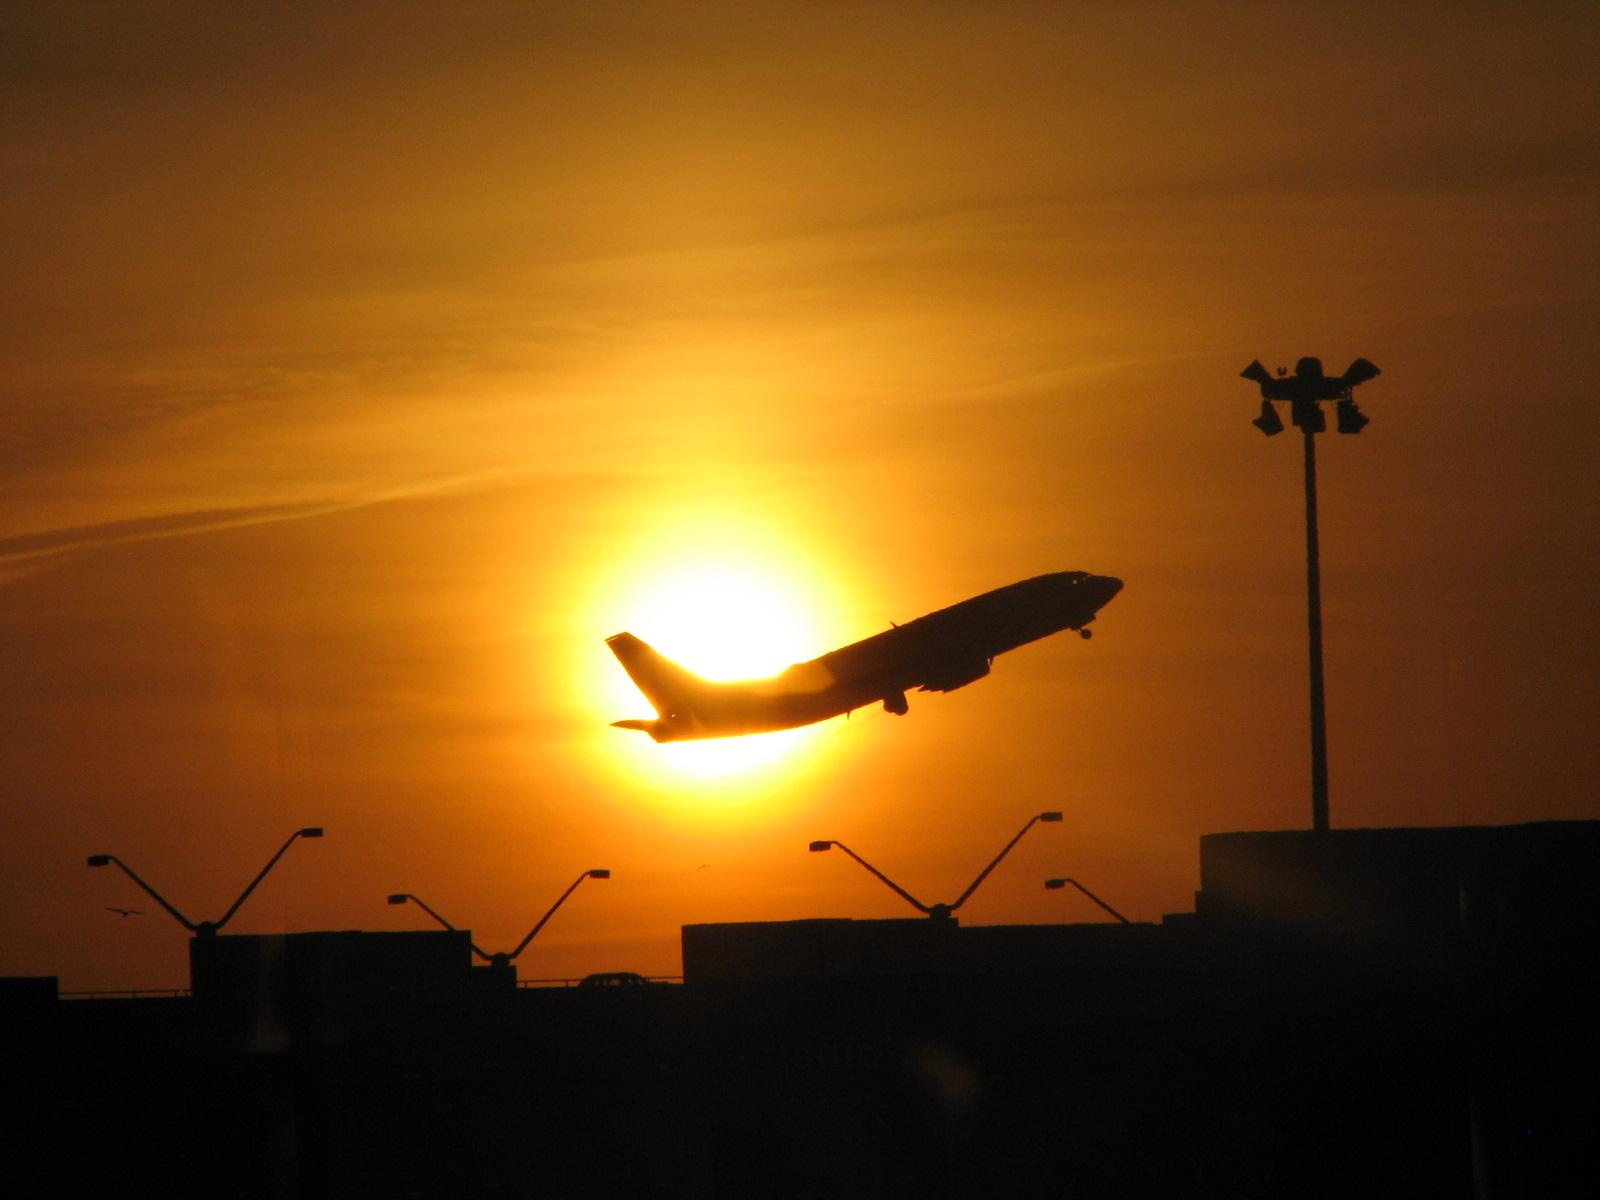 boston-airport-1449451